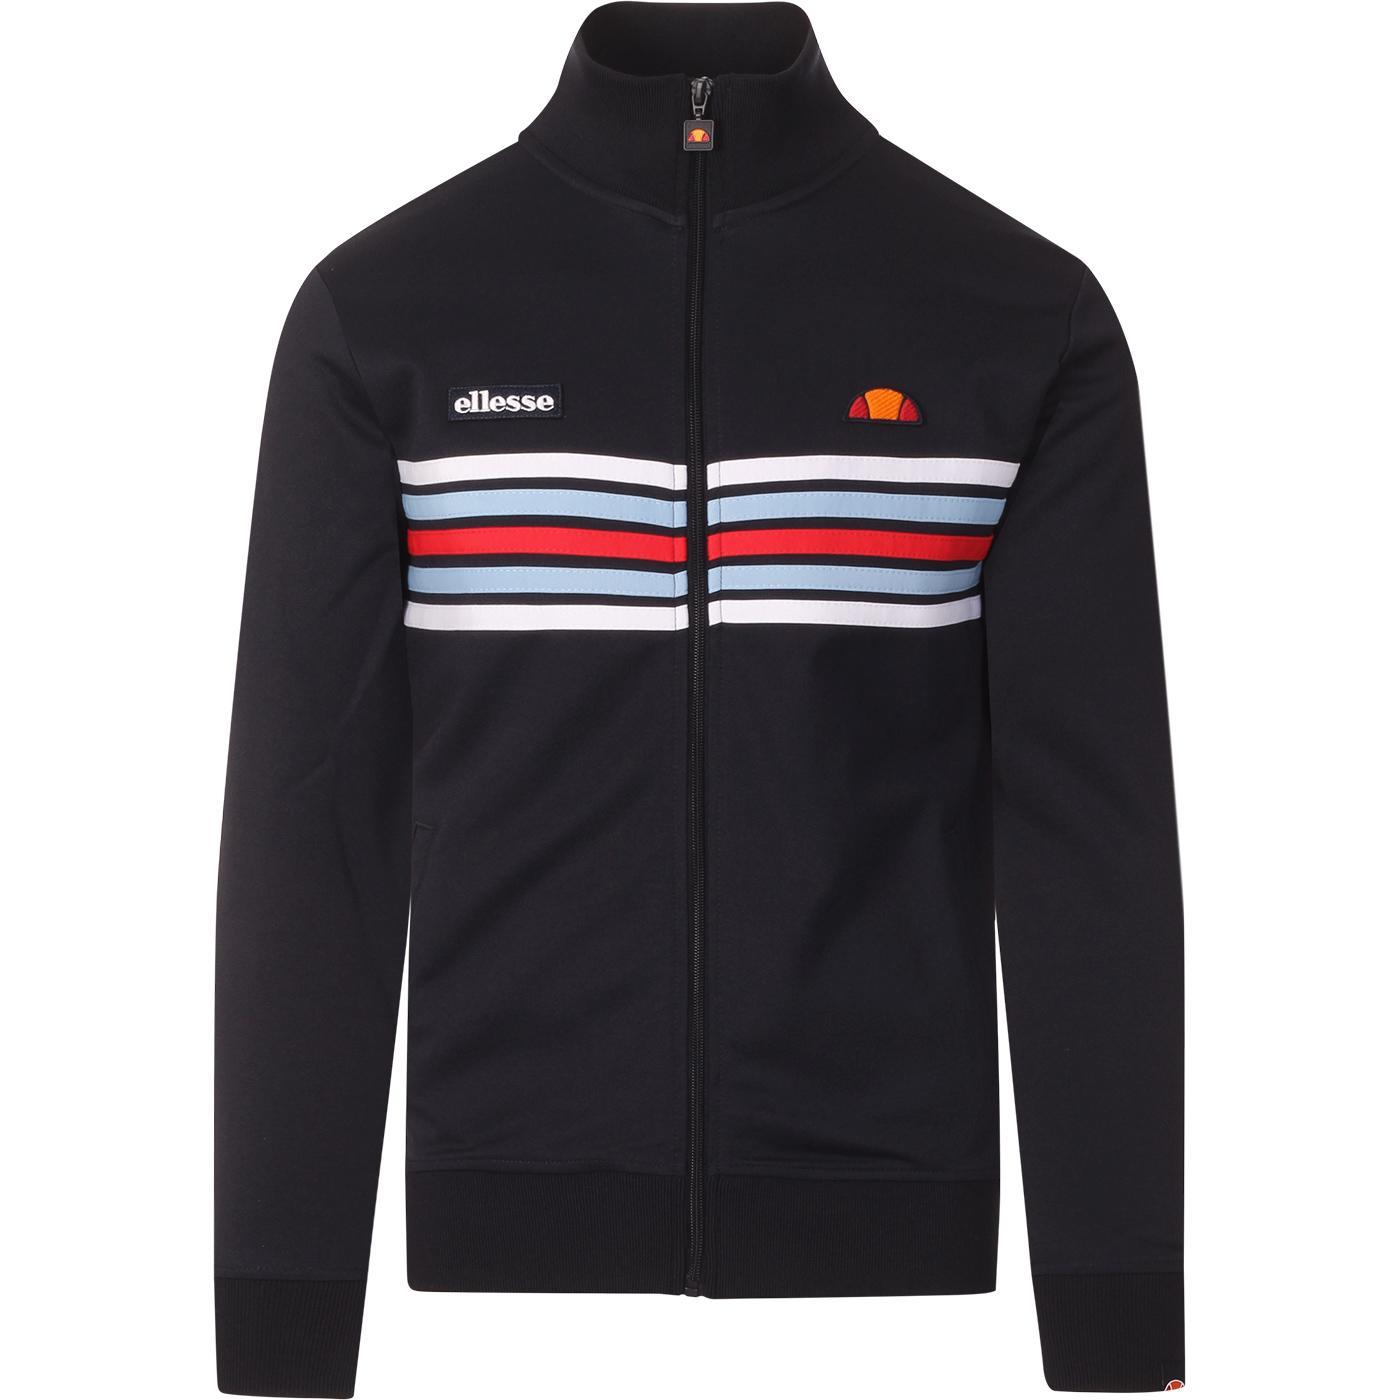 Vicenza ELLESSE Retro Chest Stripe Track Top NAVY